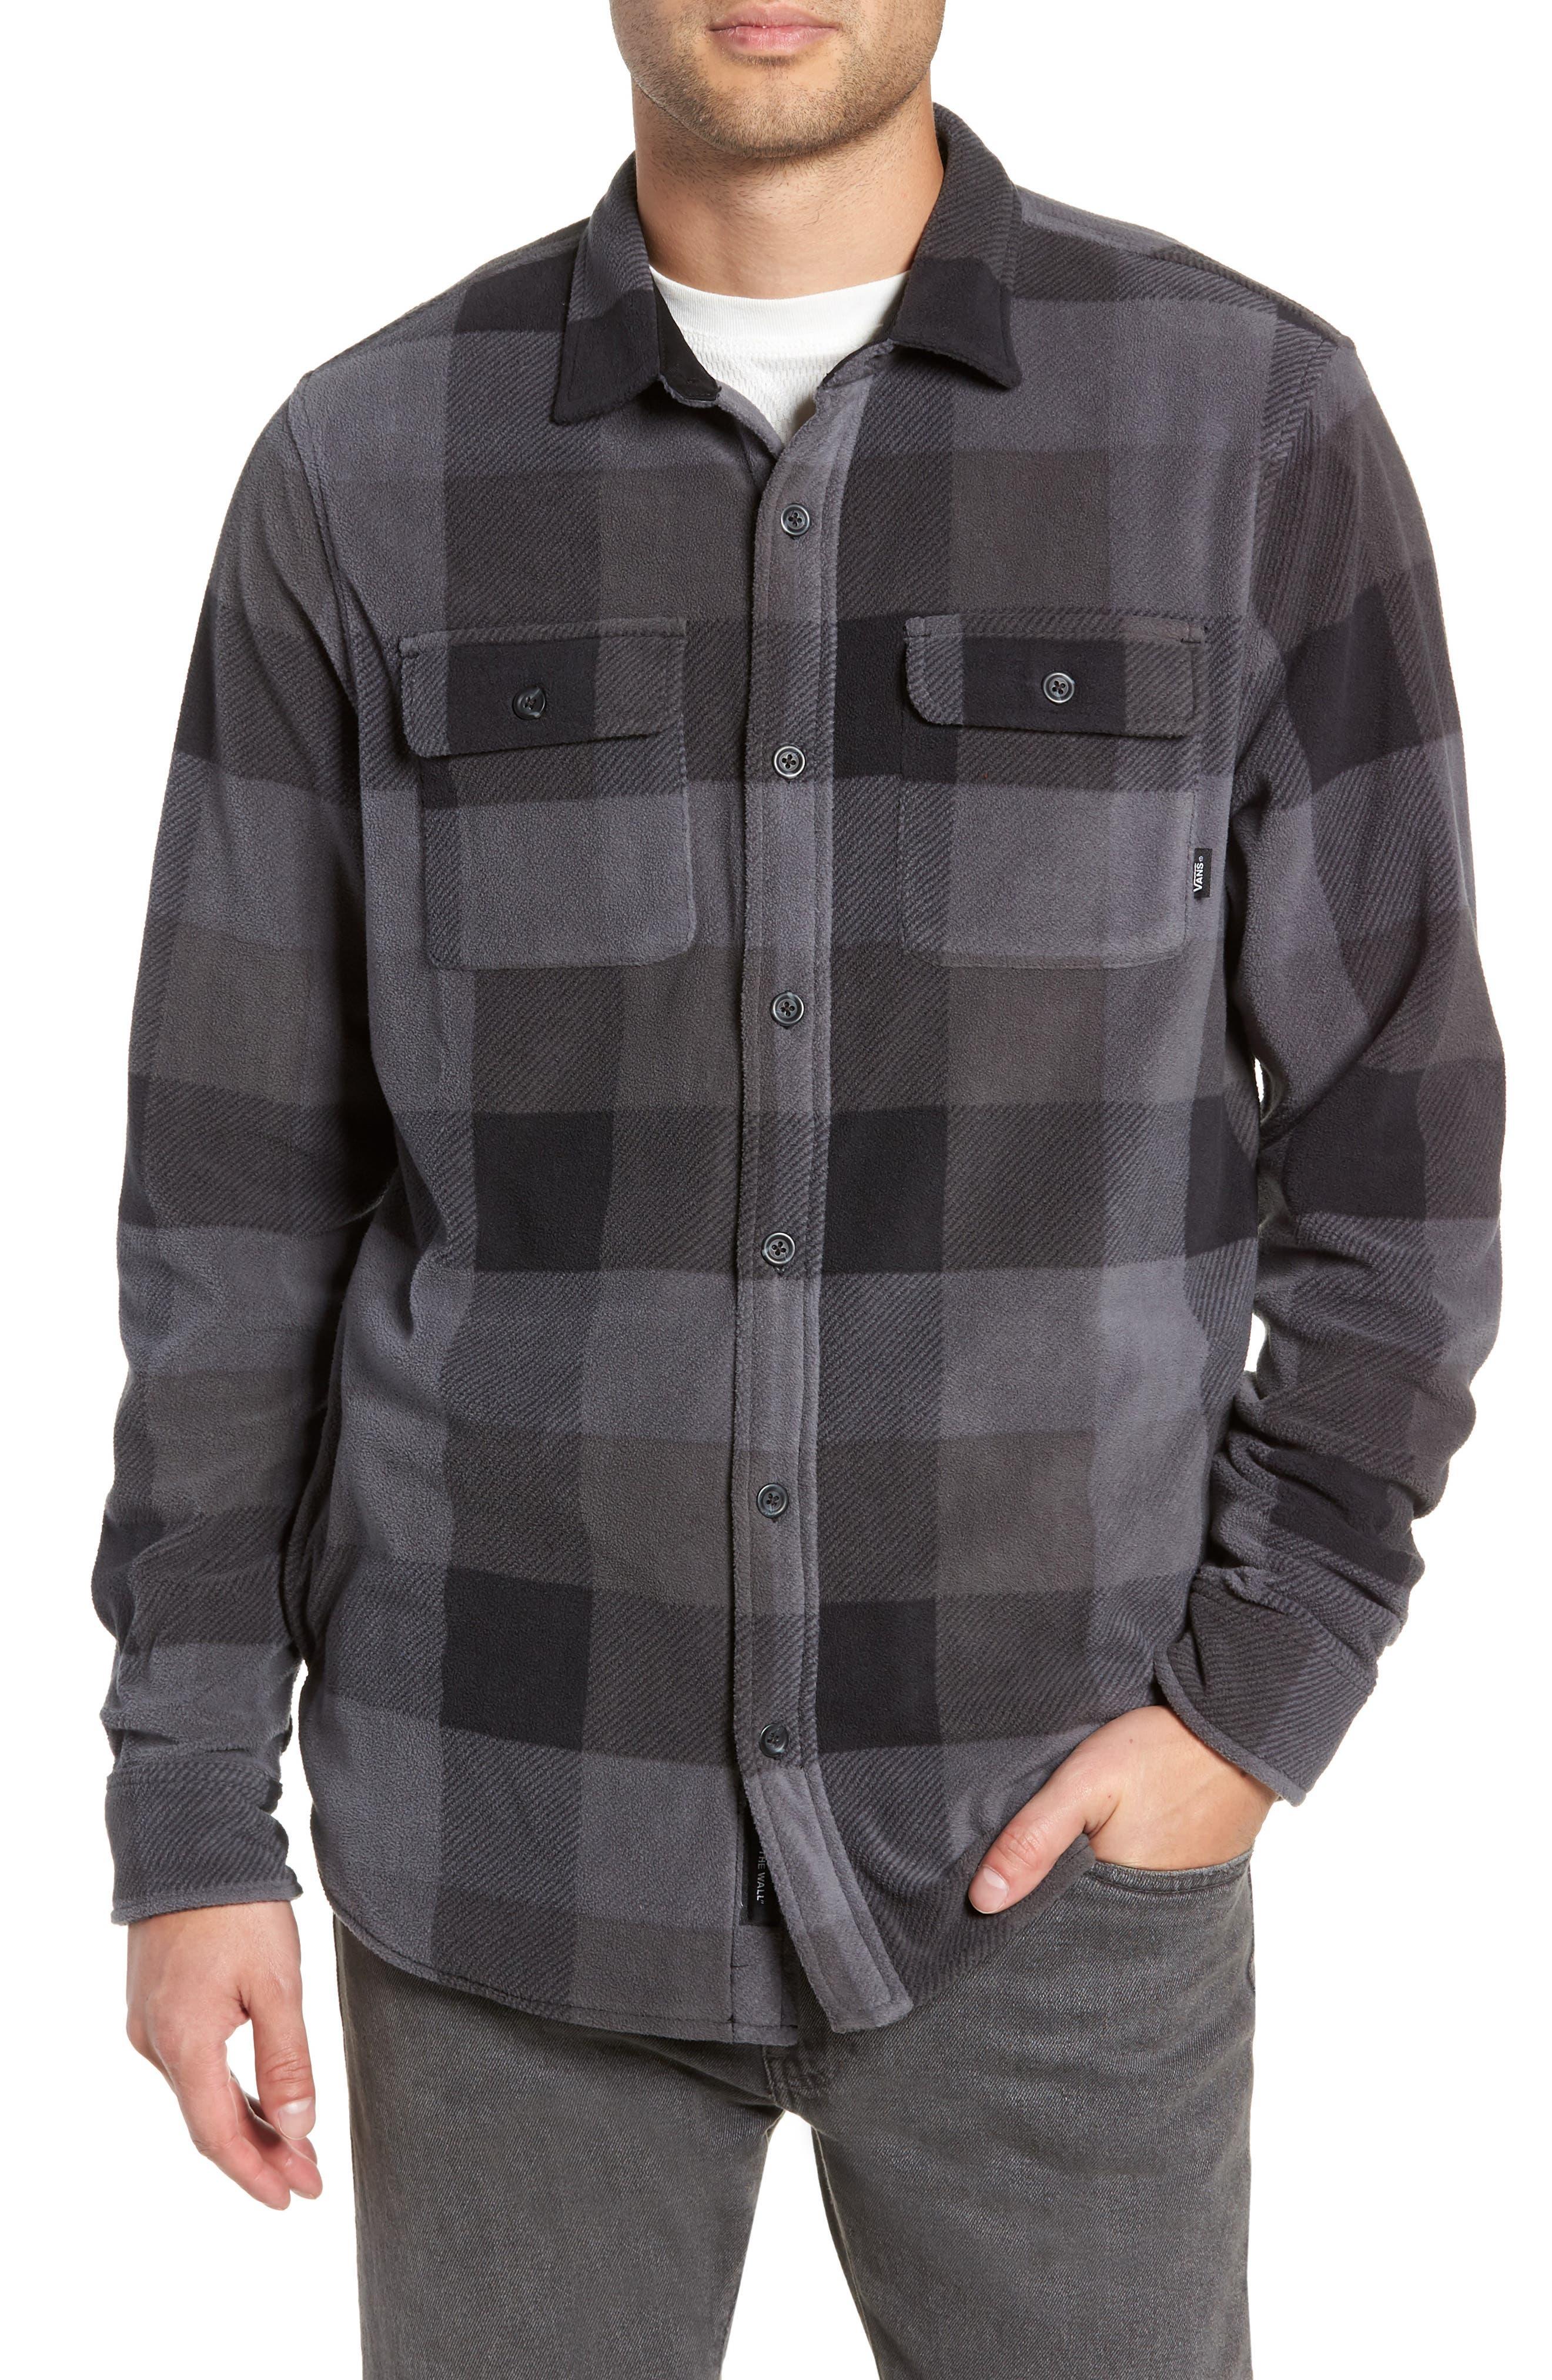 Hillcrest Polar Fleece Shirt Jacket,                         Main,                         color, BLACK/ CHARCOAL